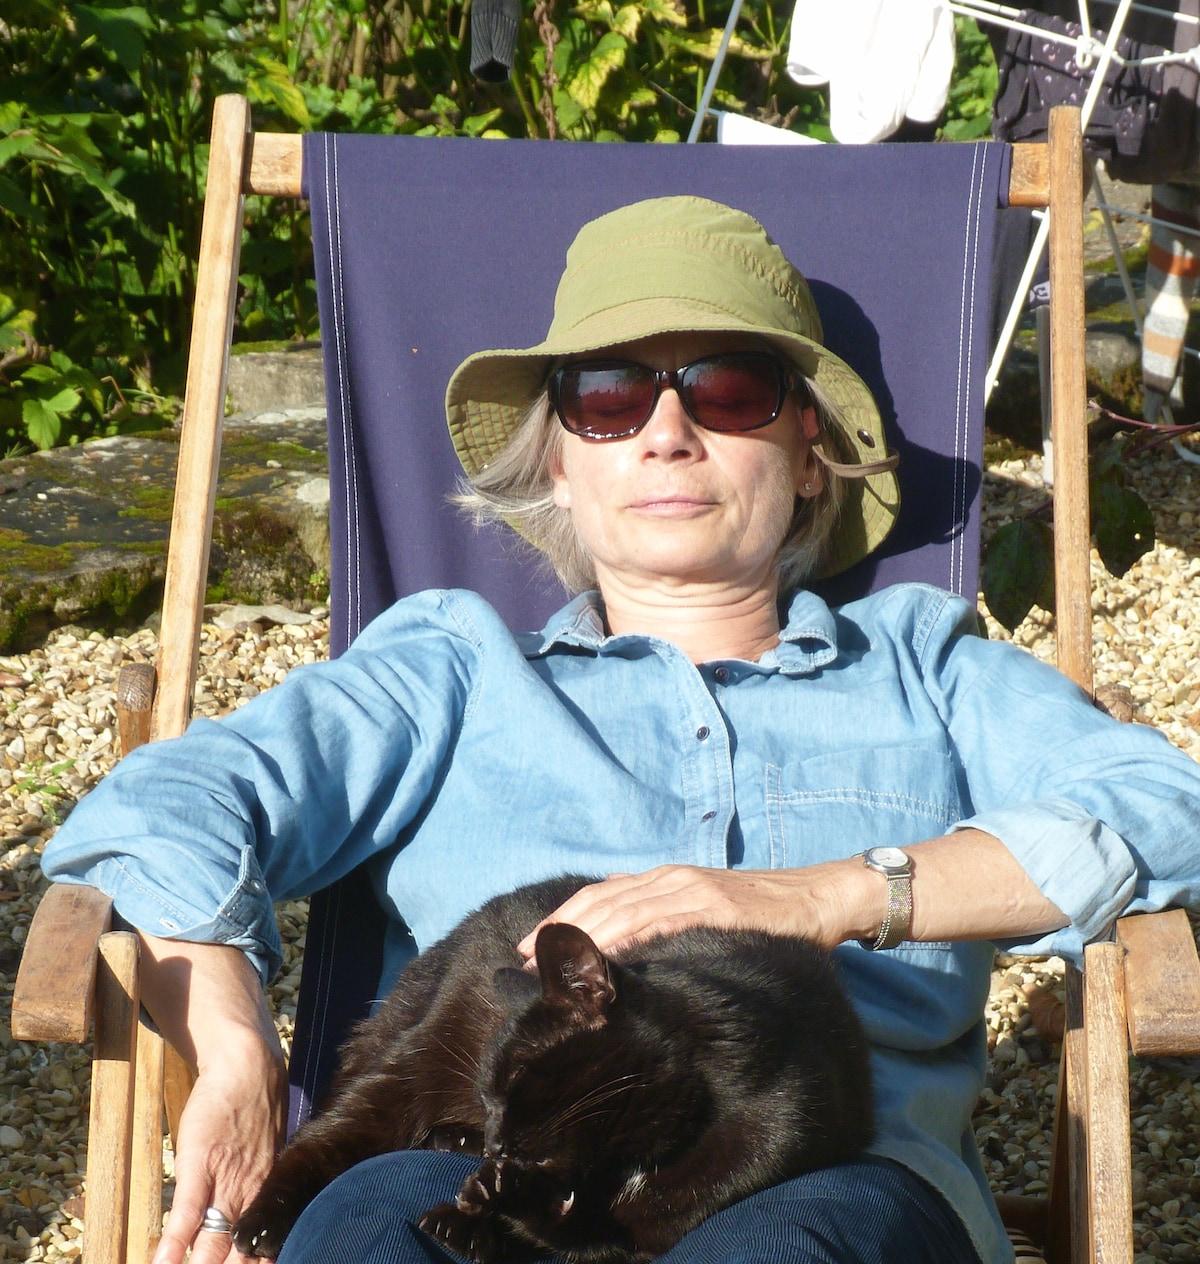 Claire from Samois-sur-Seine